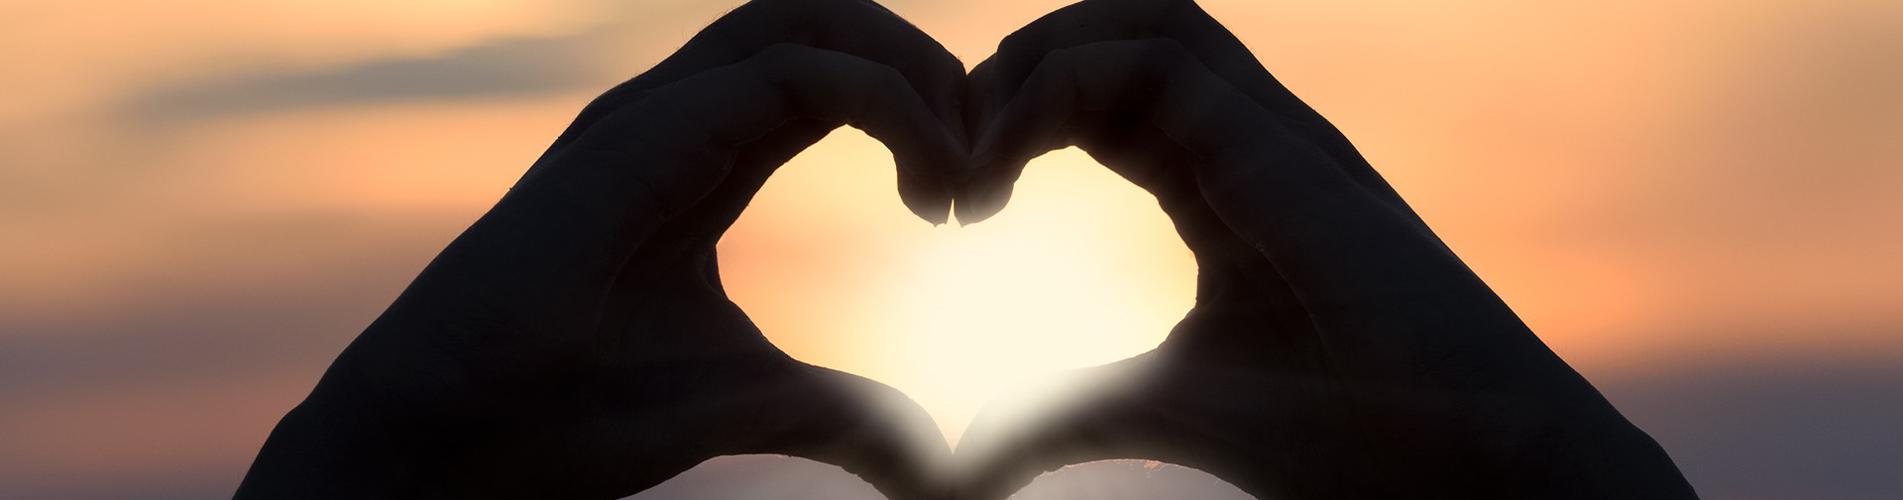 2019 AMERICAN HEART MONTH FOCUS: CHOLESTEROL